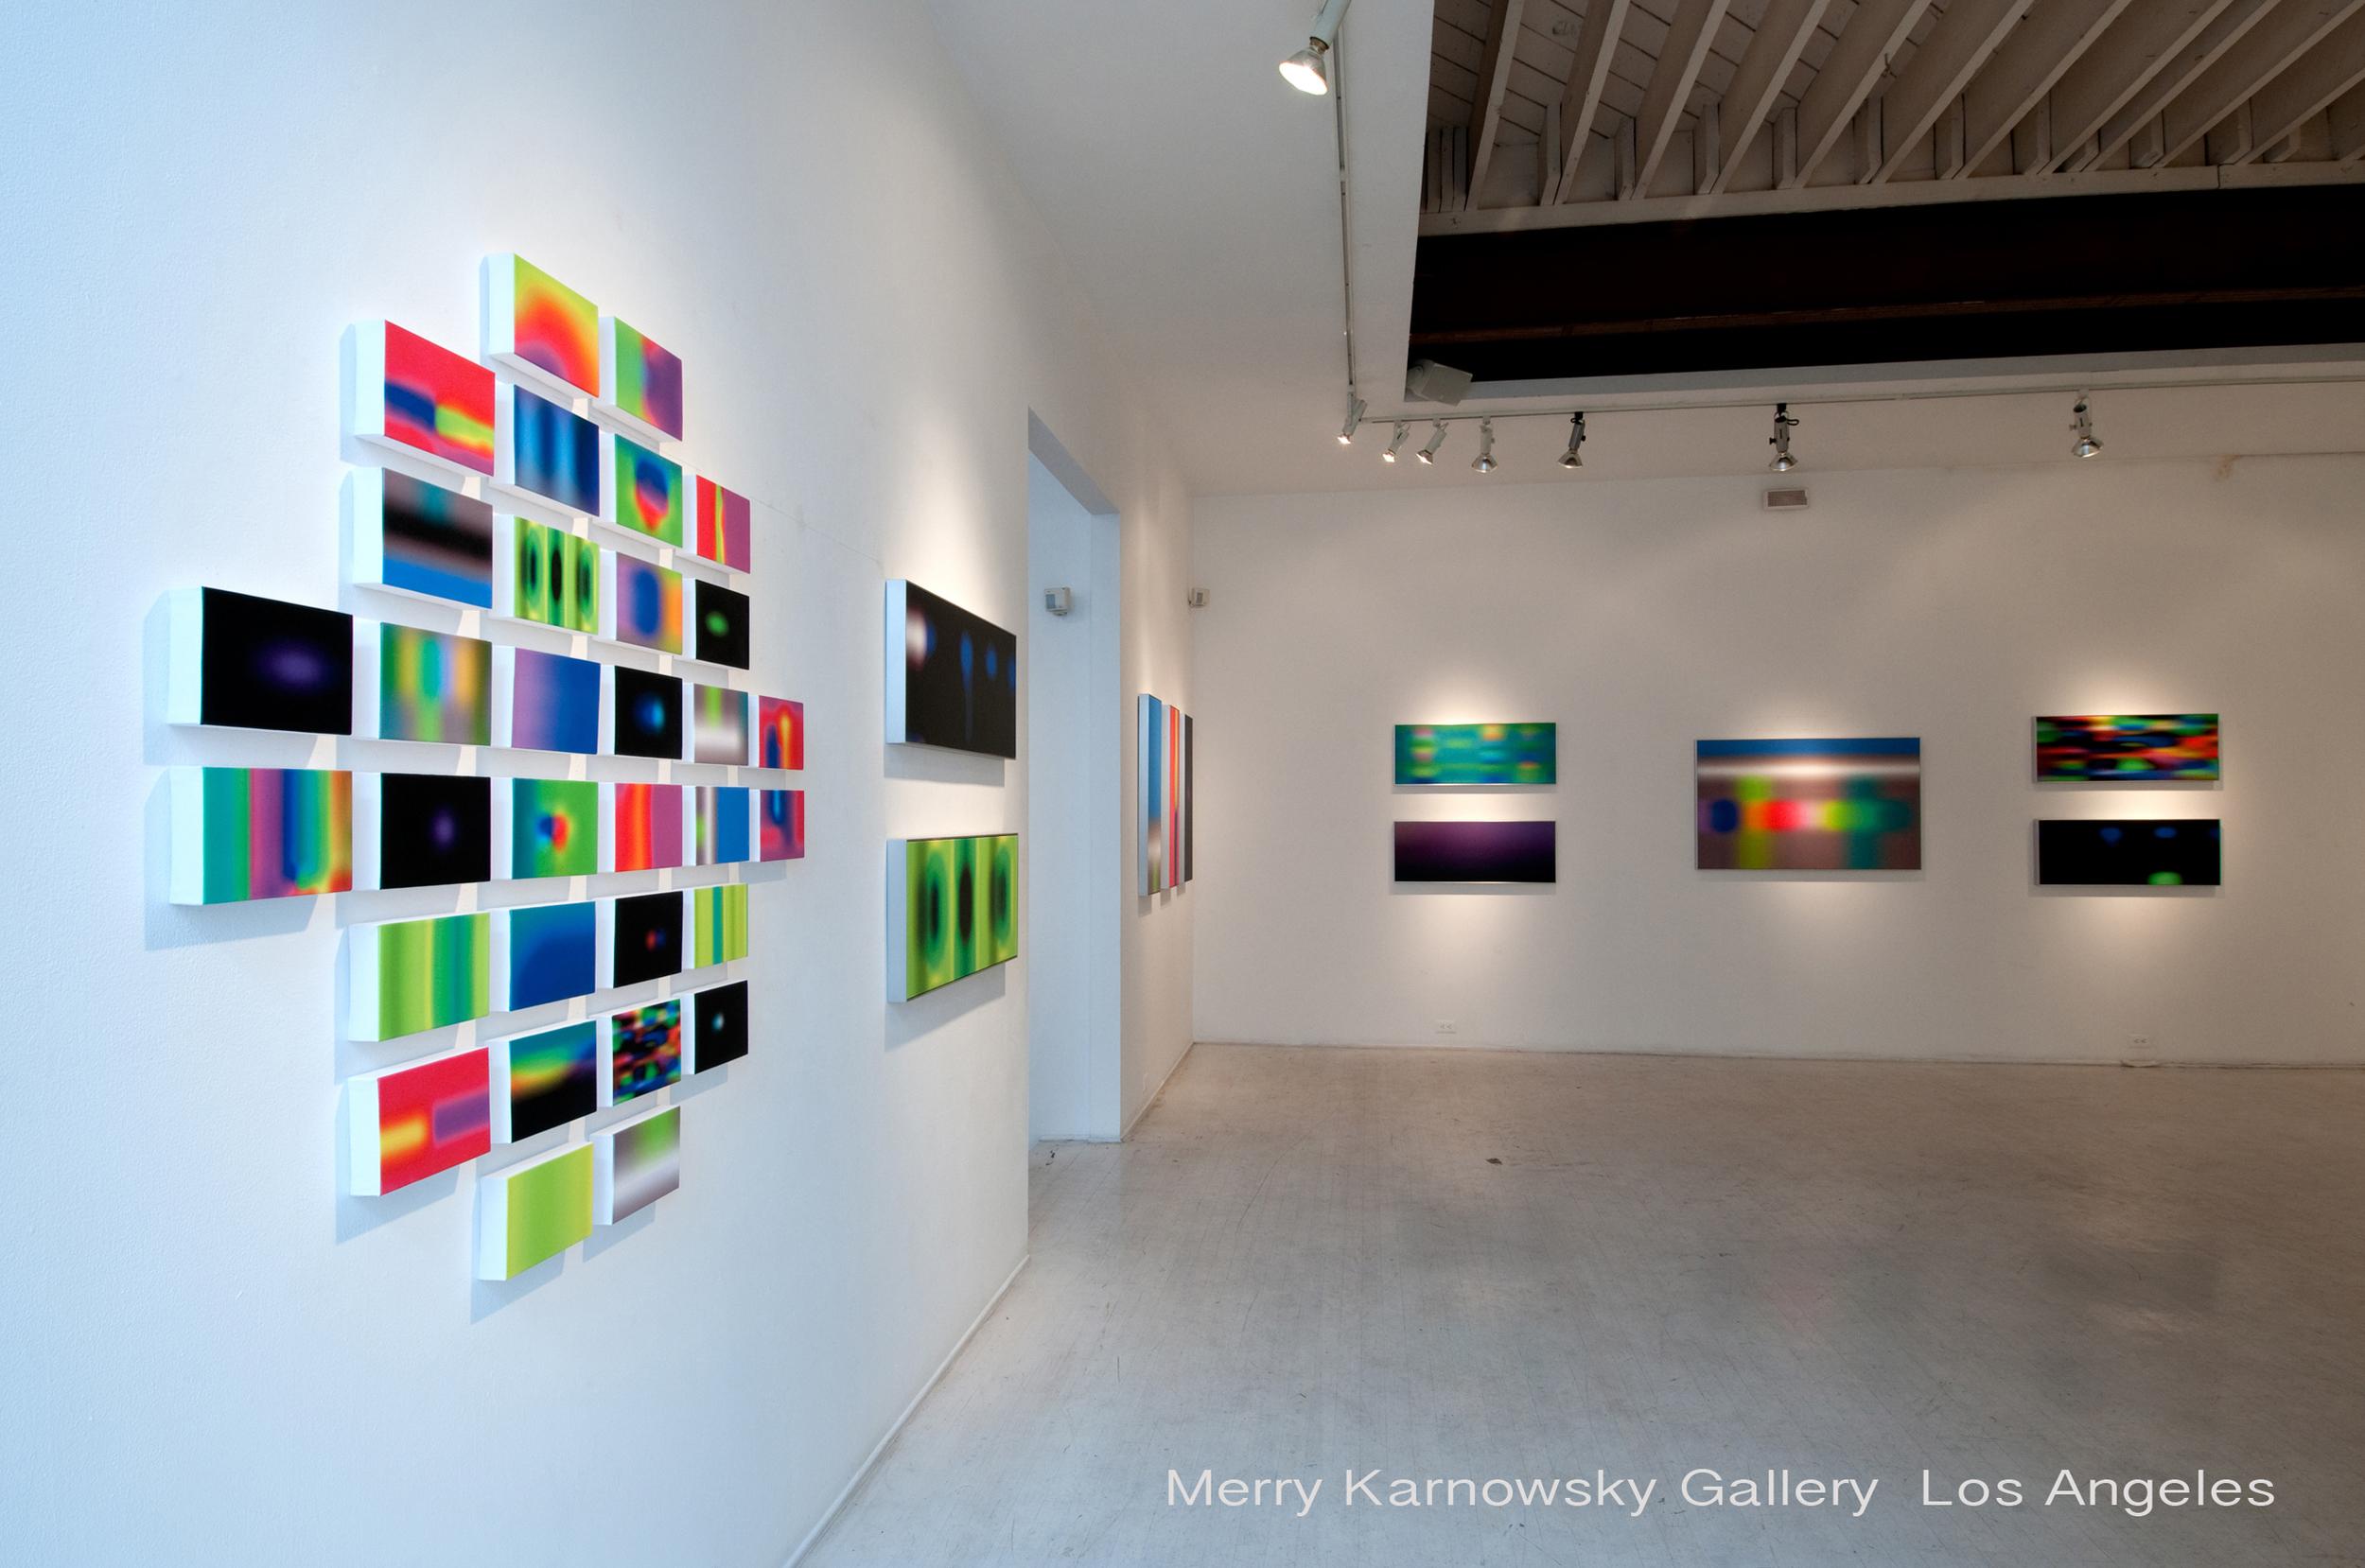 12. color beyond merry karnowski gallery 11 cropped.jpg